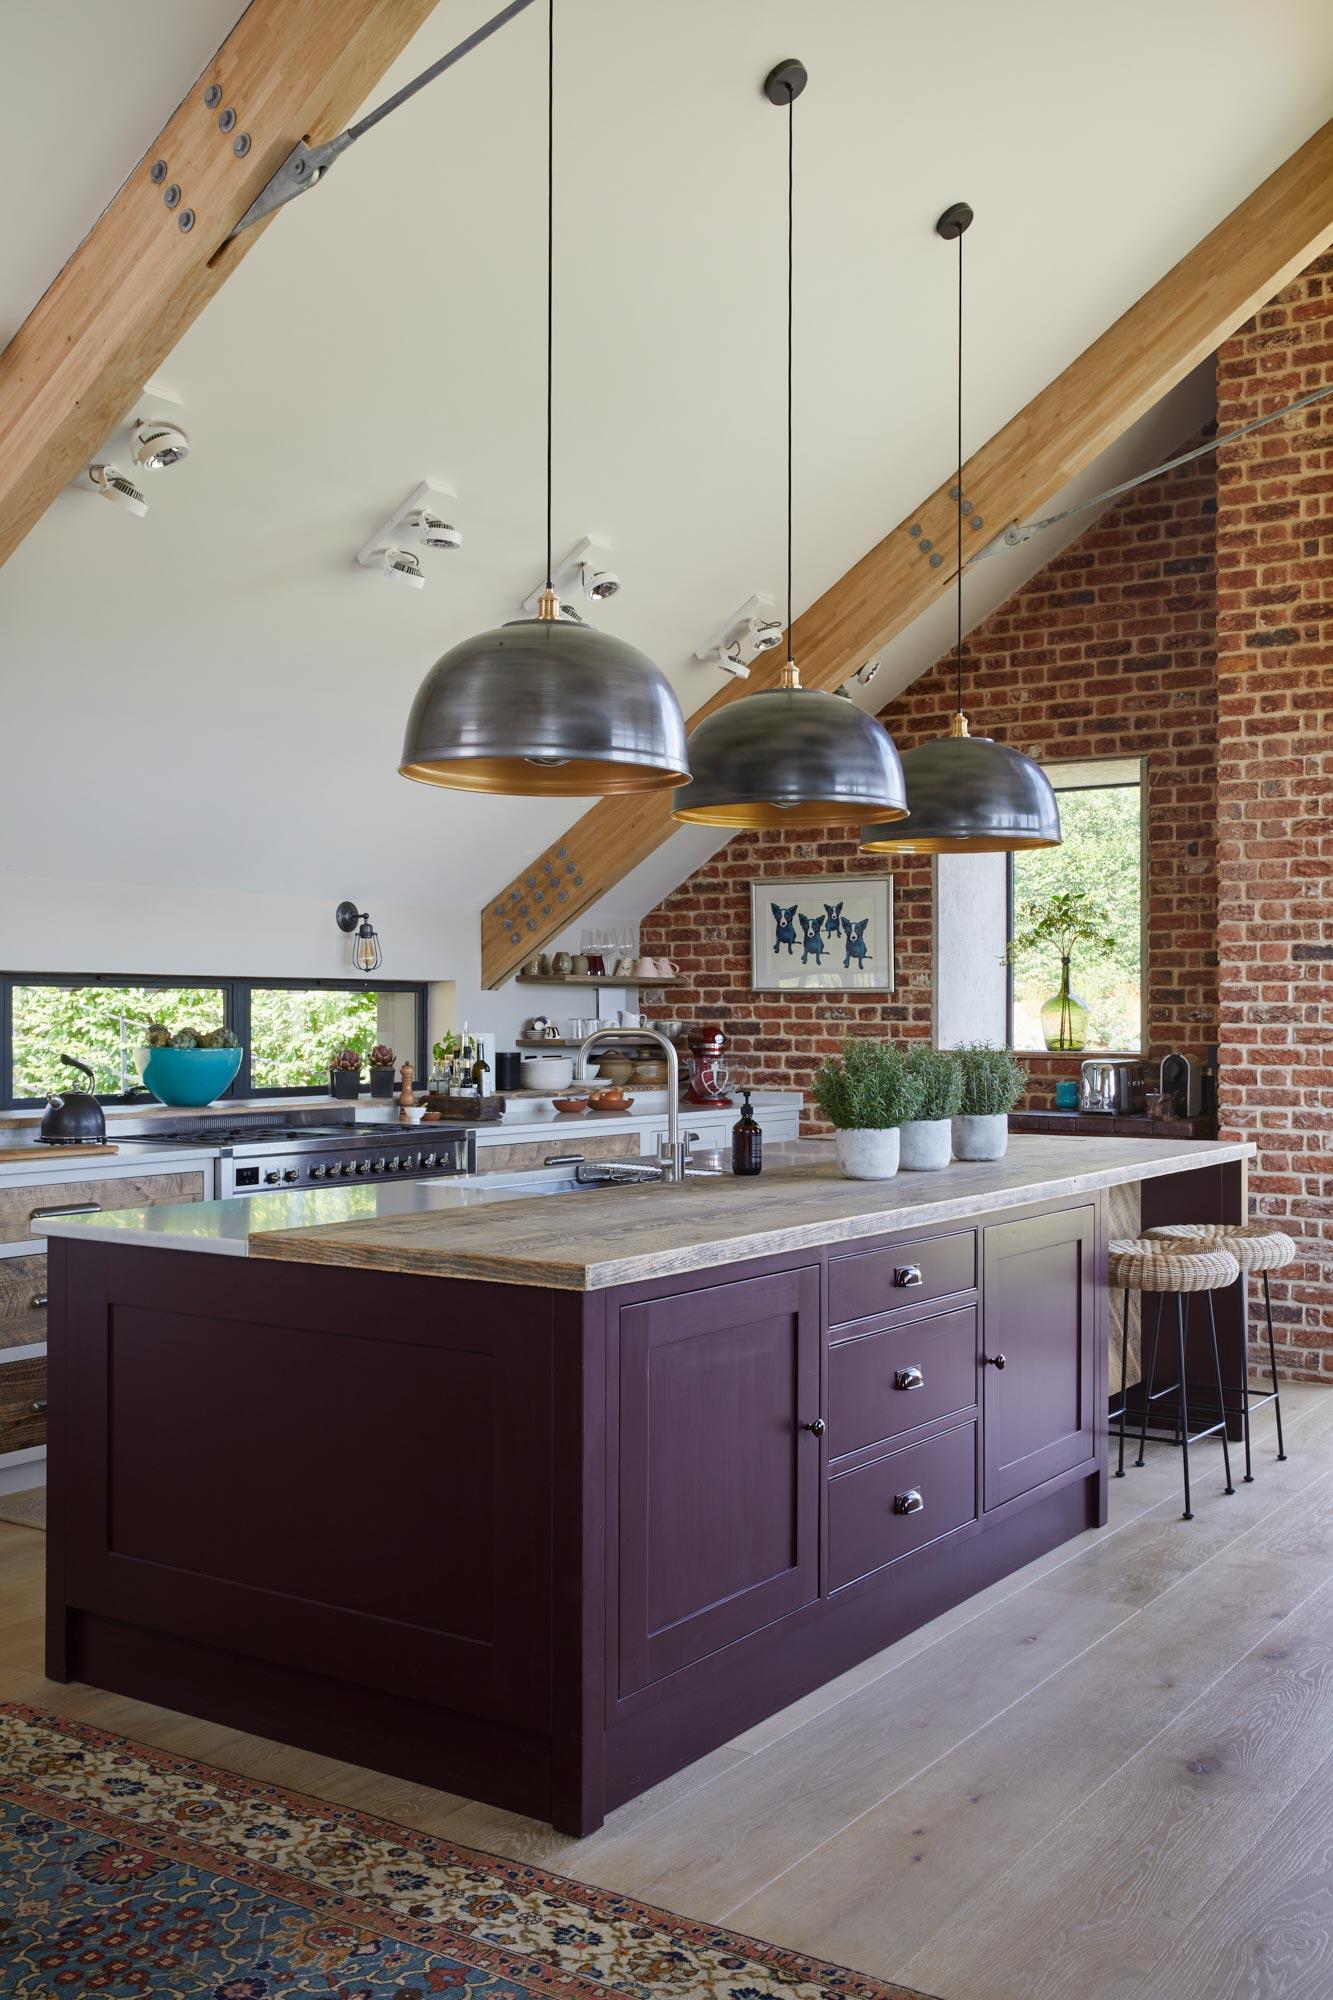 Deep purple painted kitchen